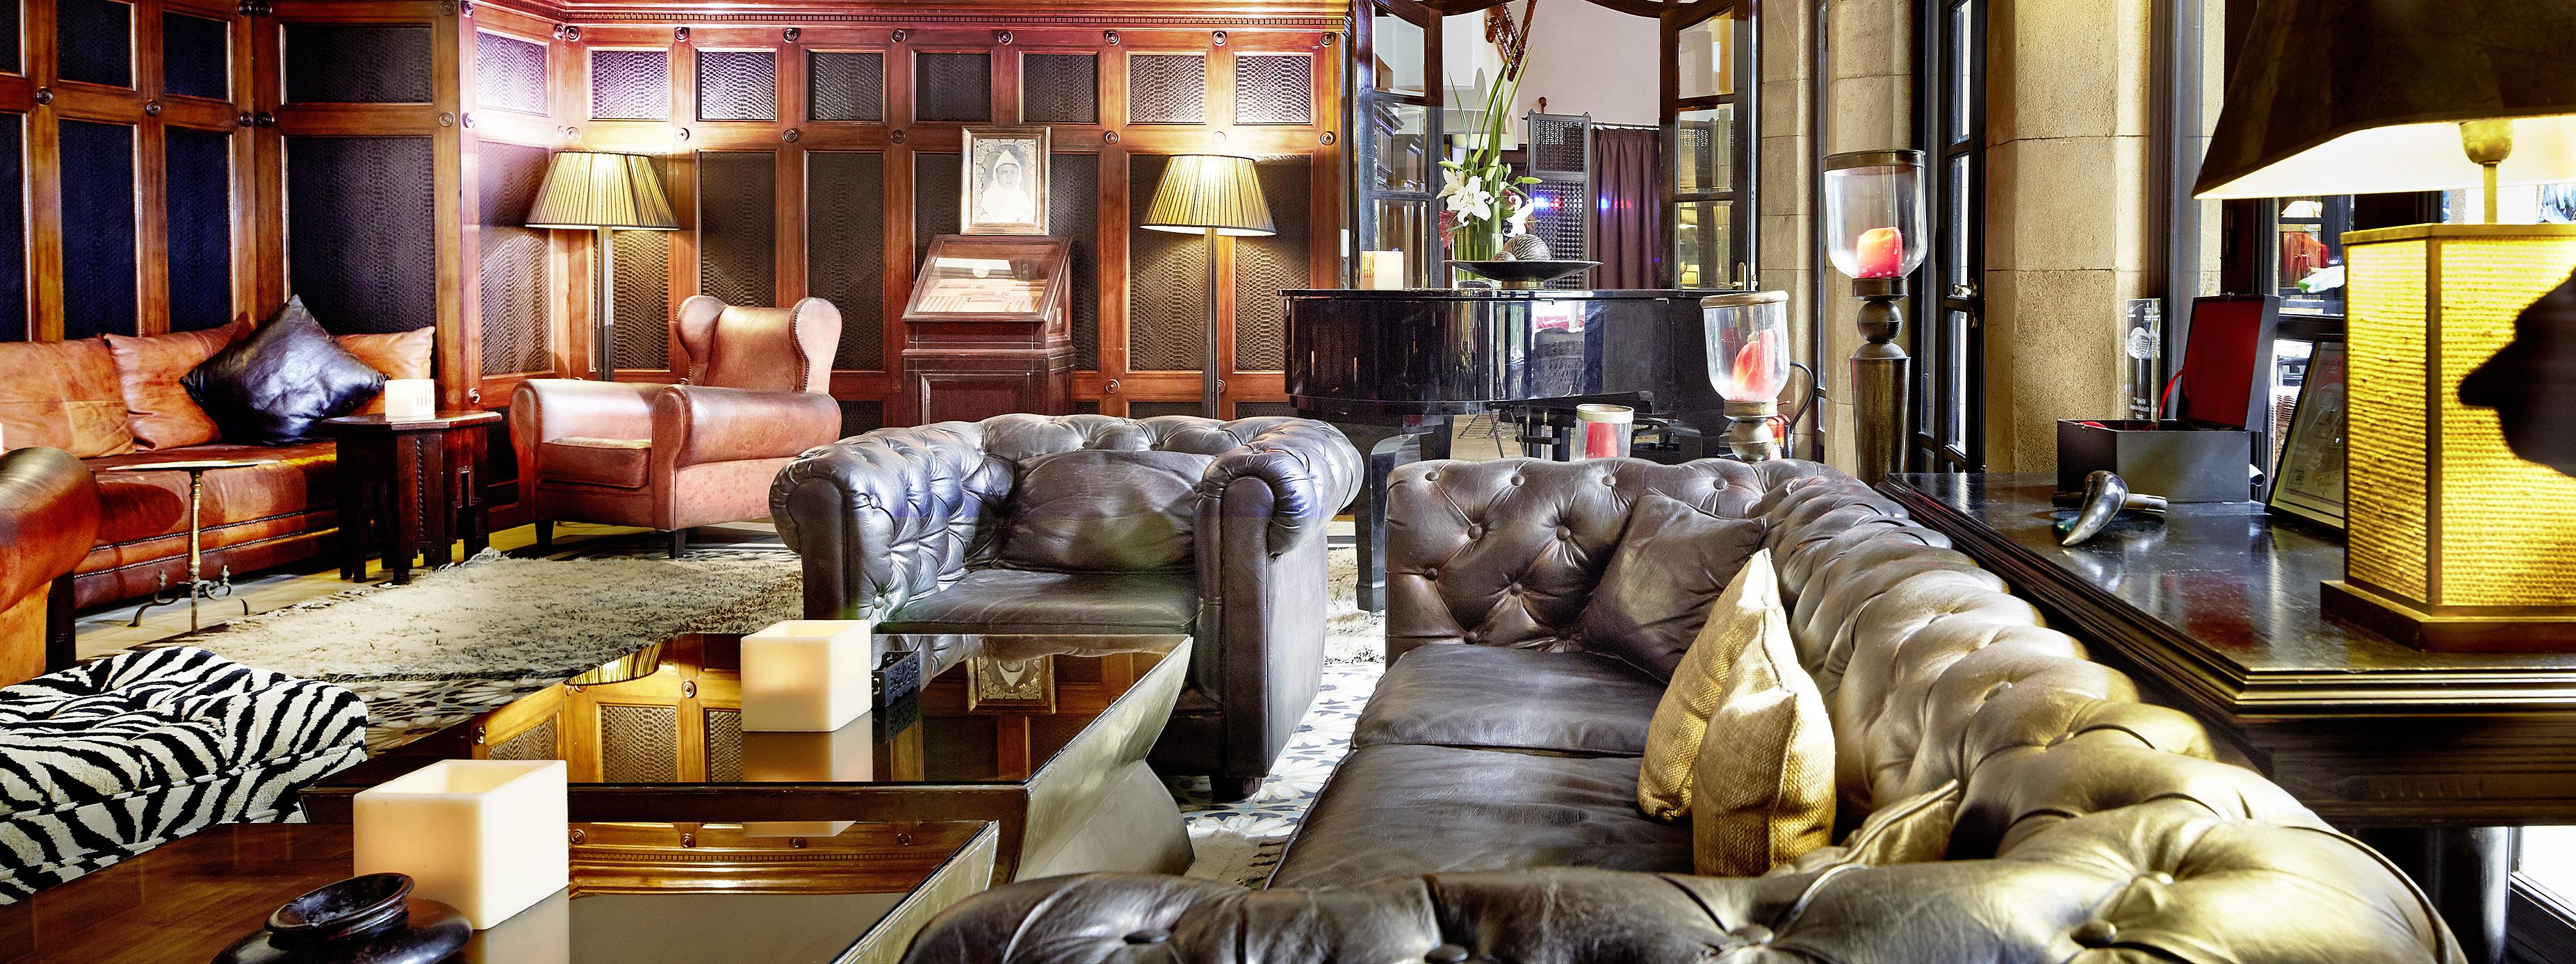 heure-bleue-hotel-bar-lounge